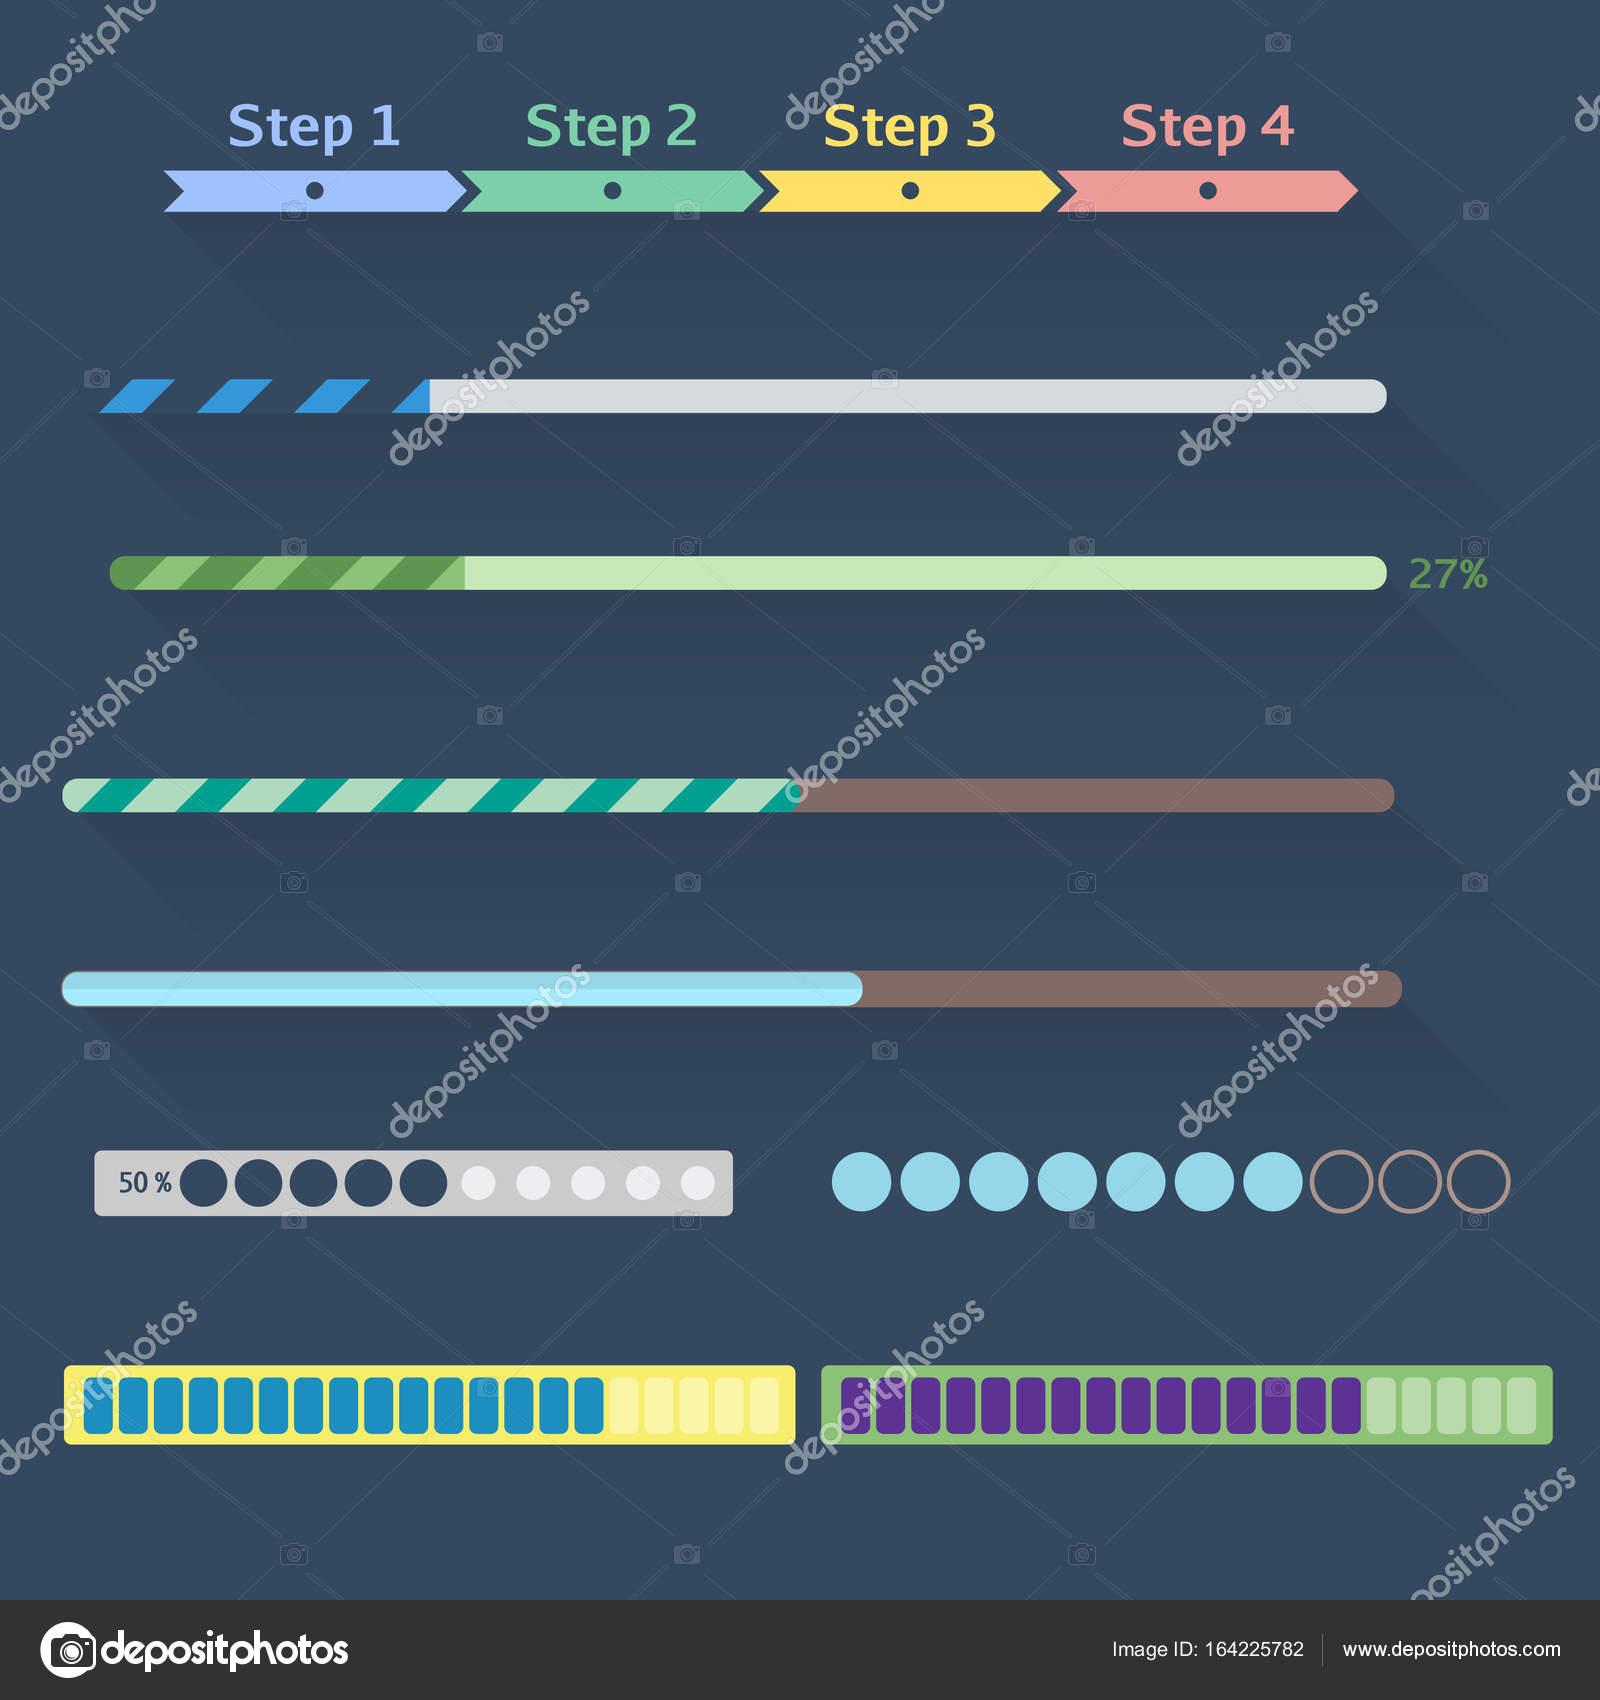 Conjunto de barras de progresso stock photo polovinkinalegmail conjunto de barras de progresso do plano de web design conjunto de vrios elementos usados para projetos de interface do usurio foto de ccuart Gallery